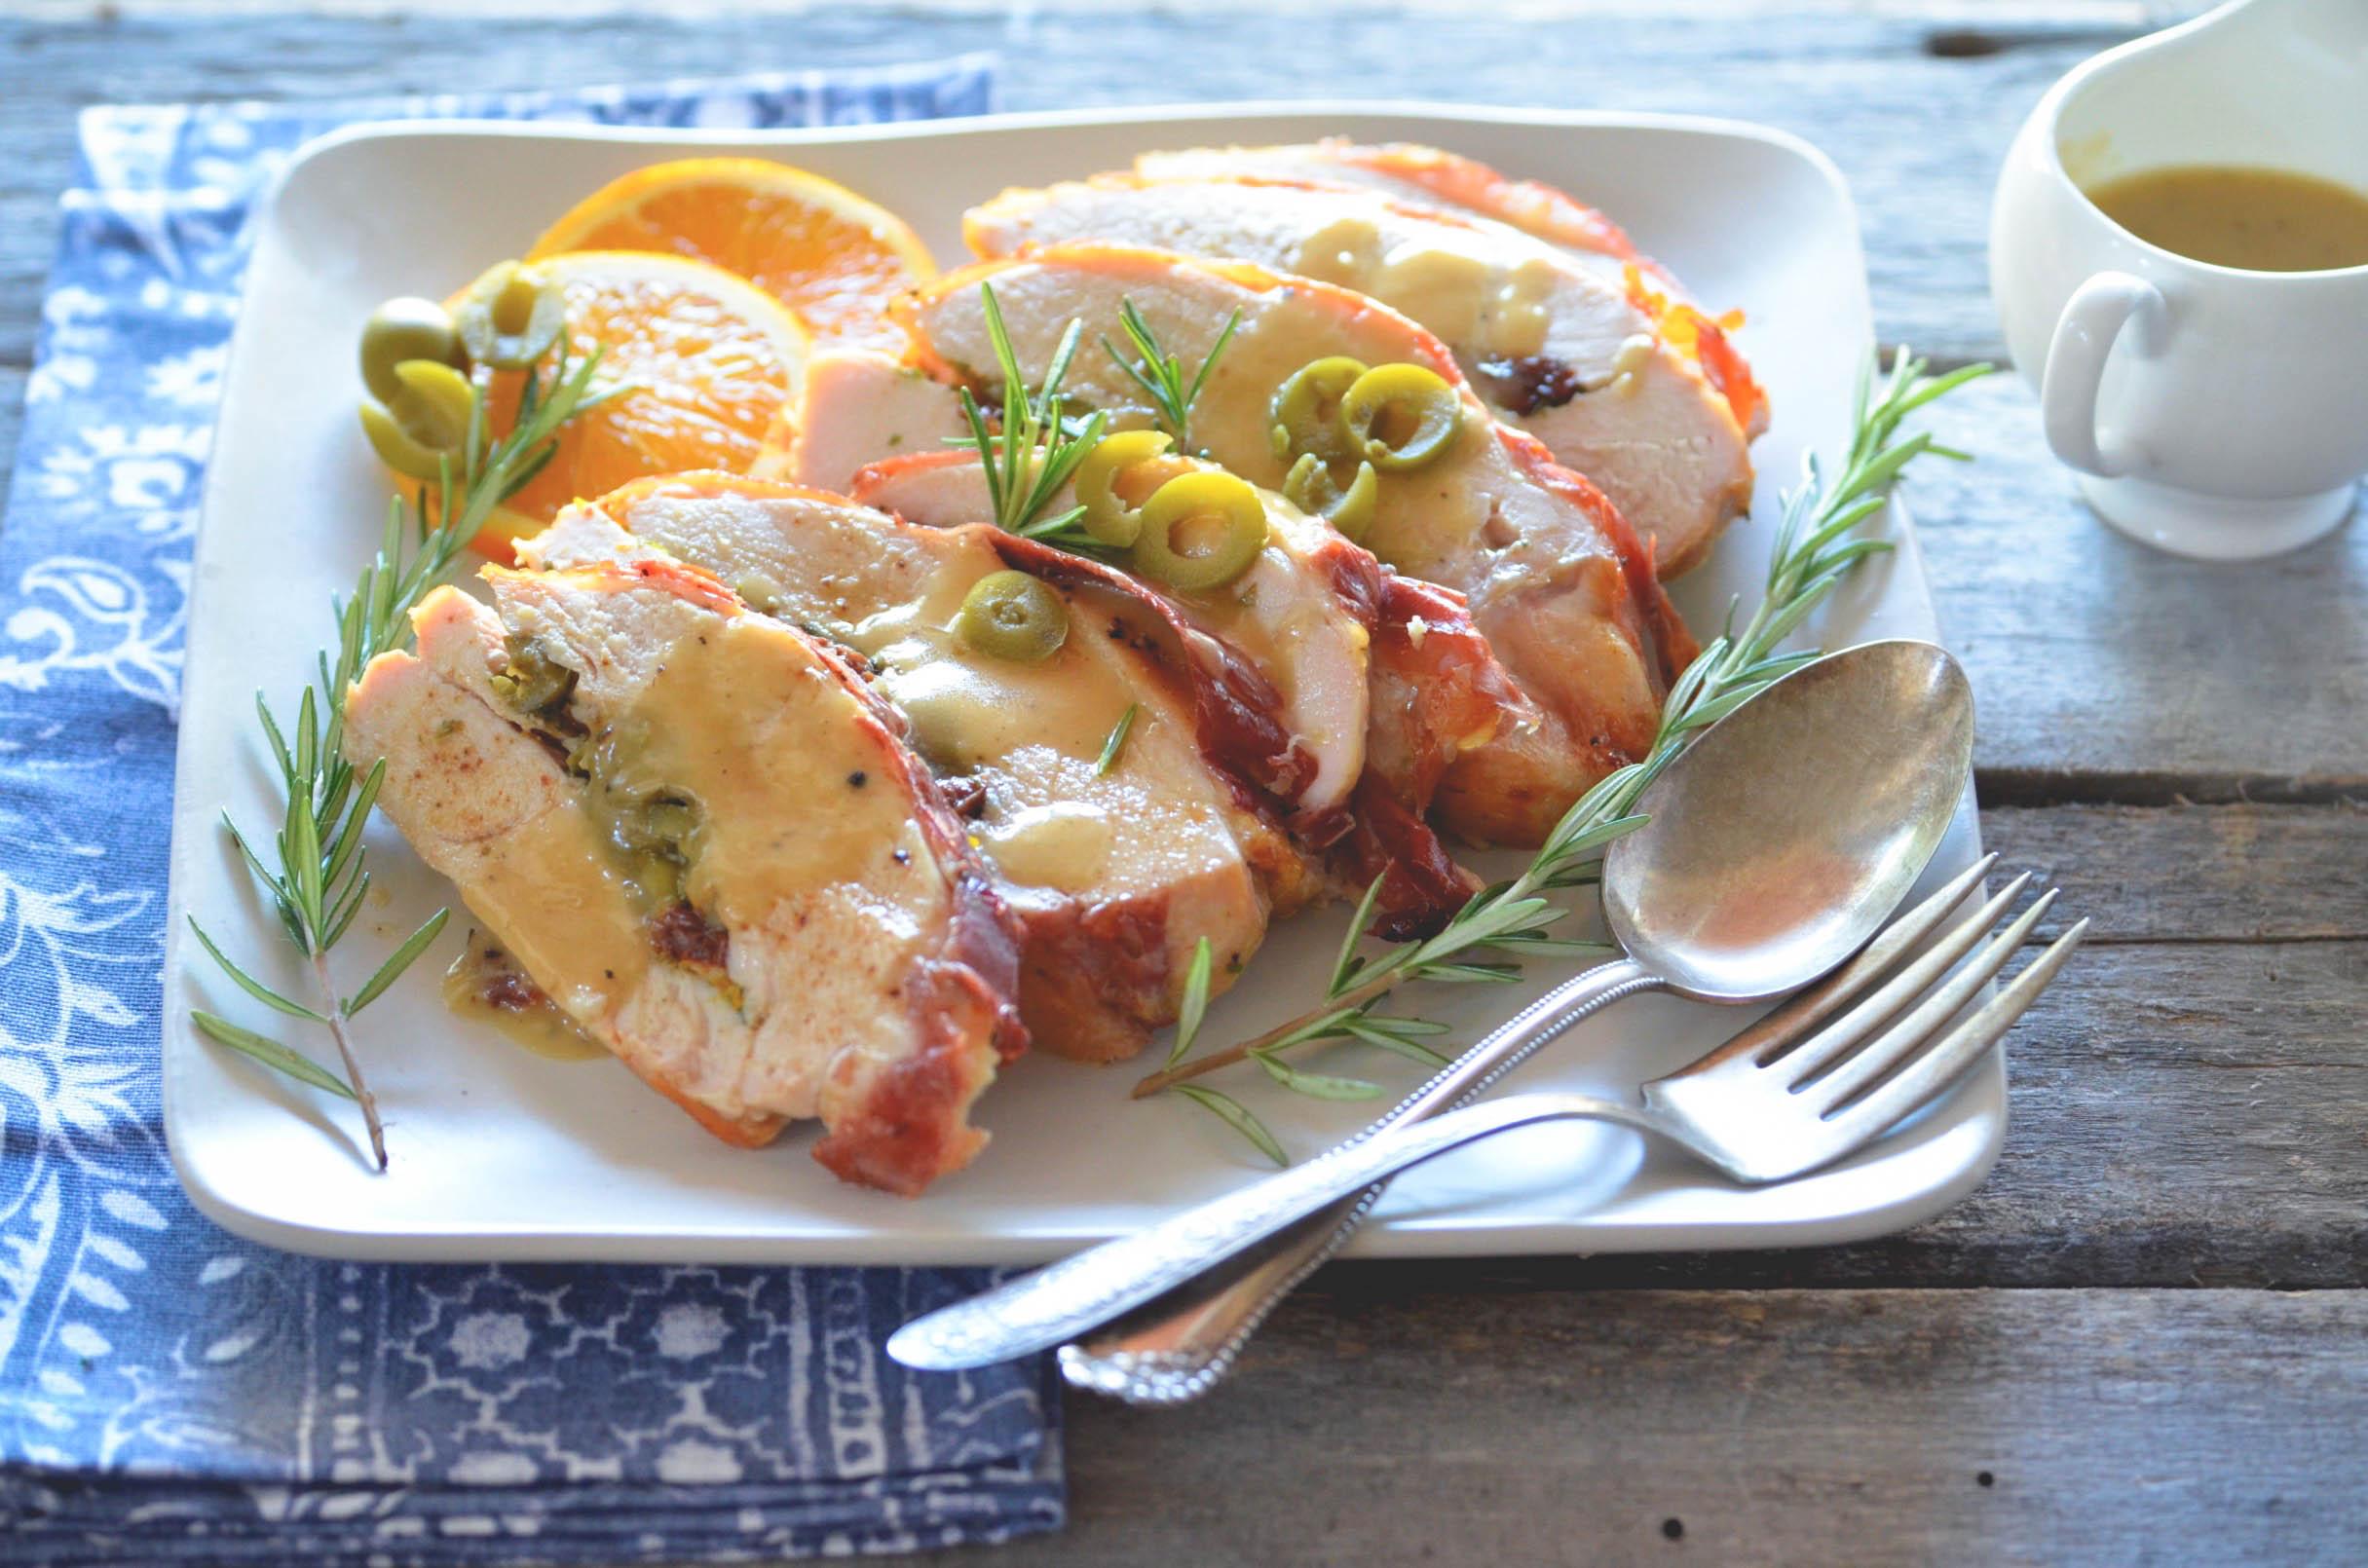 Prosciutto Wrapped Turkey Breast with California Ripe Olives